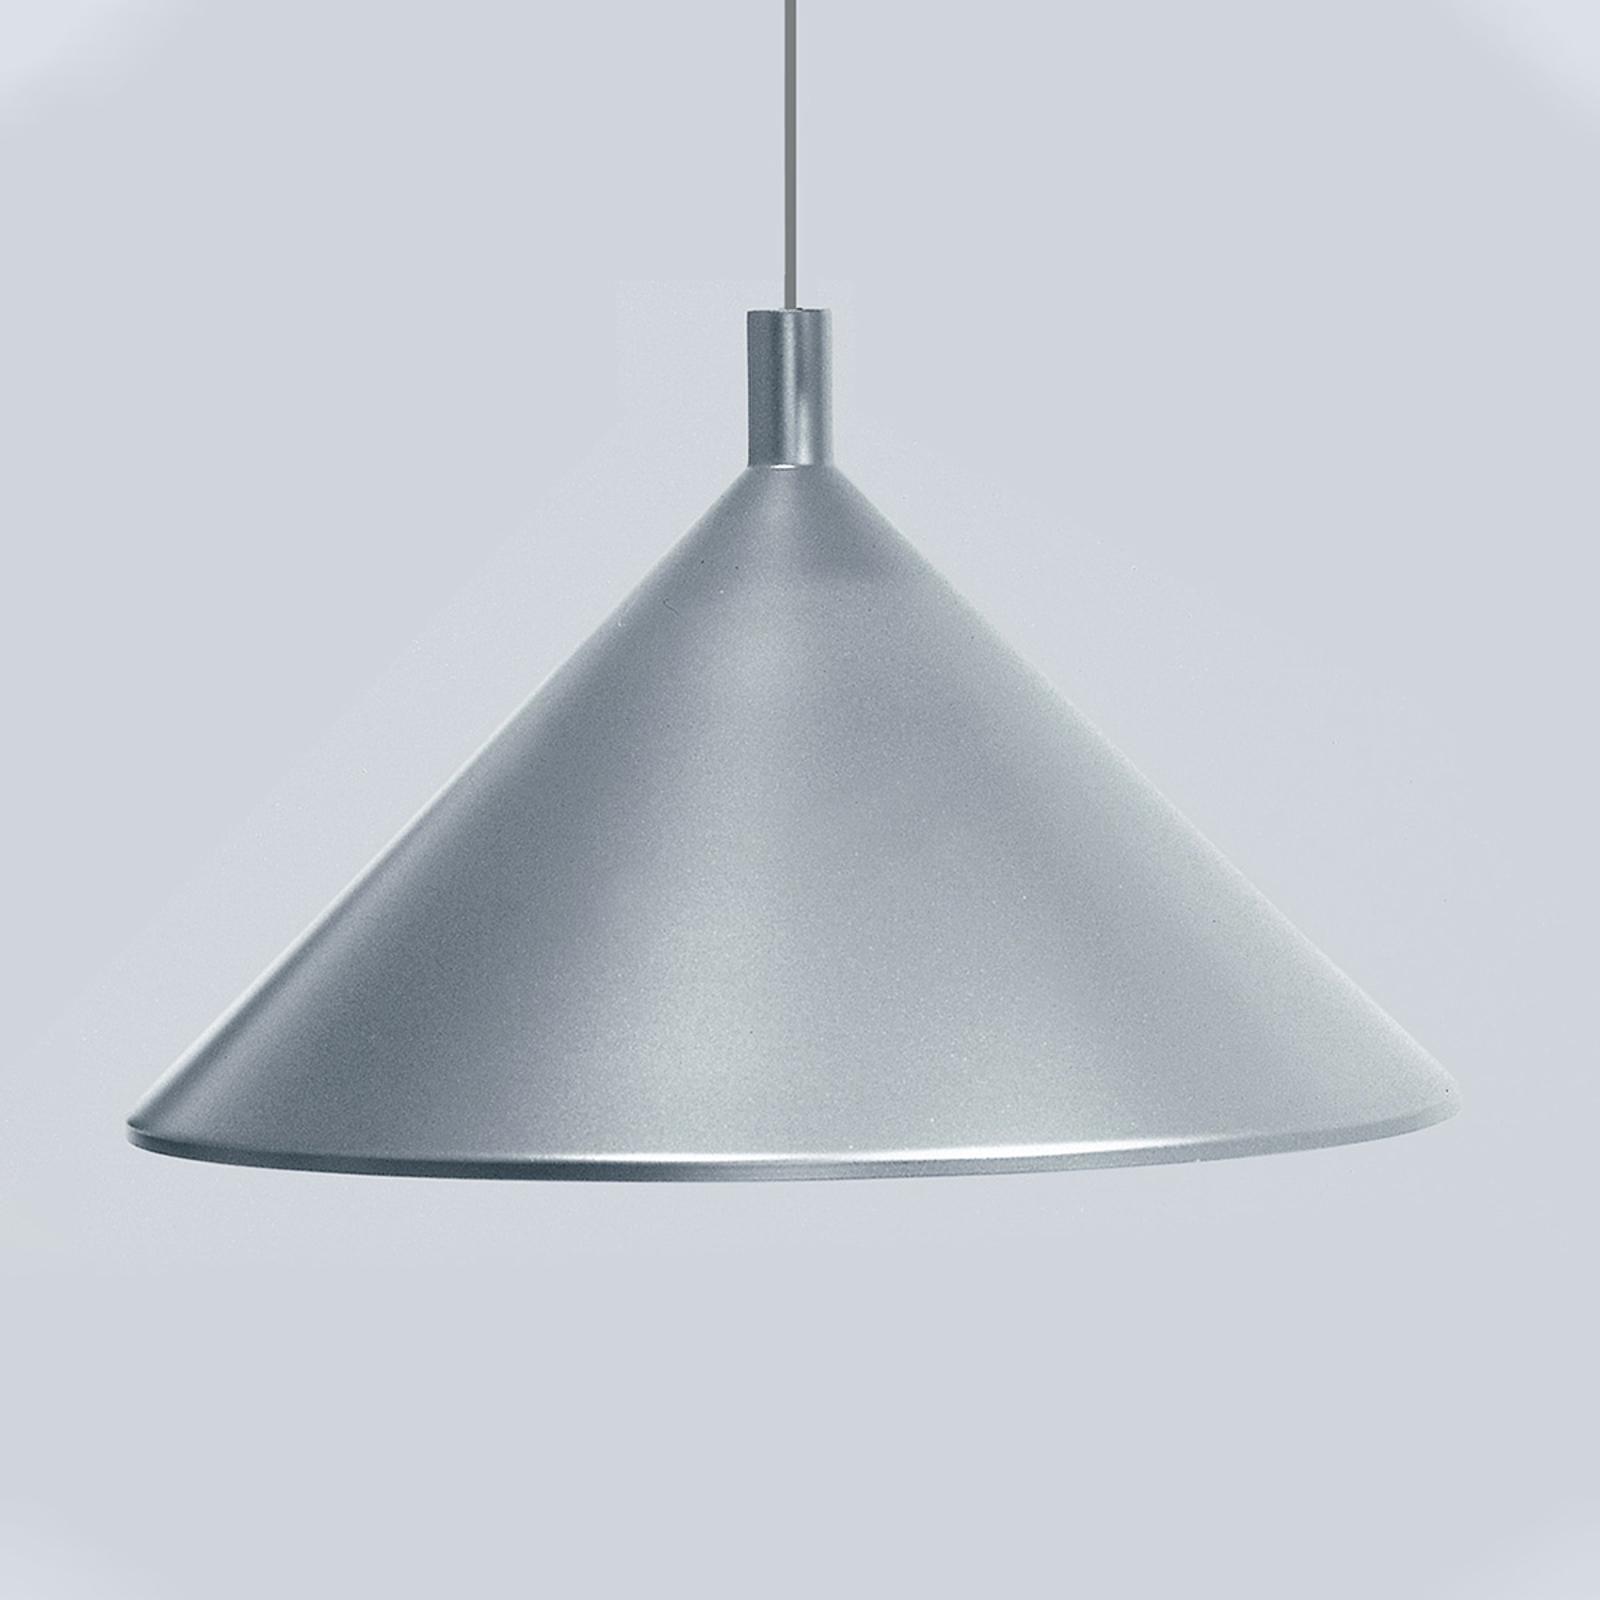 Martinelli Luce Cono Hängeleuchte grau, Ø 30 cm